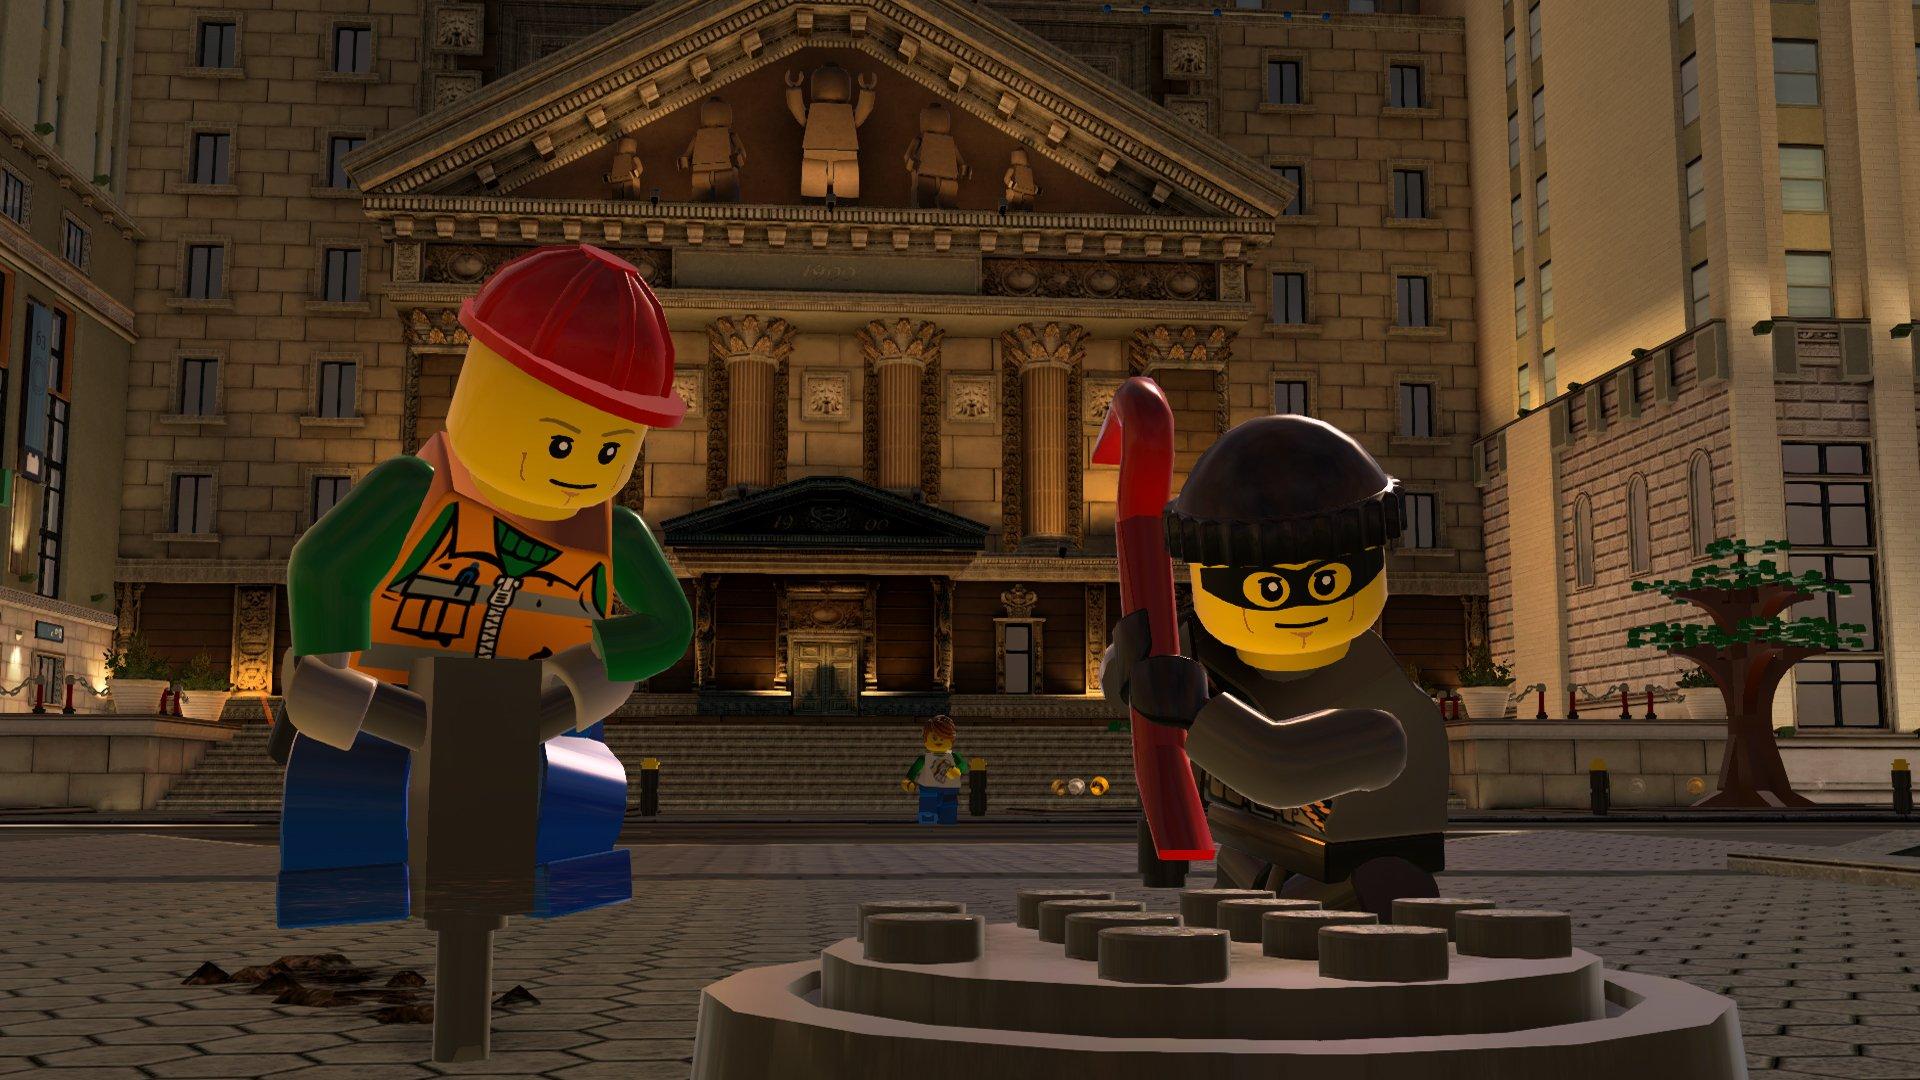 lego_city_stories-3689870.jpg